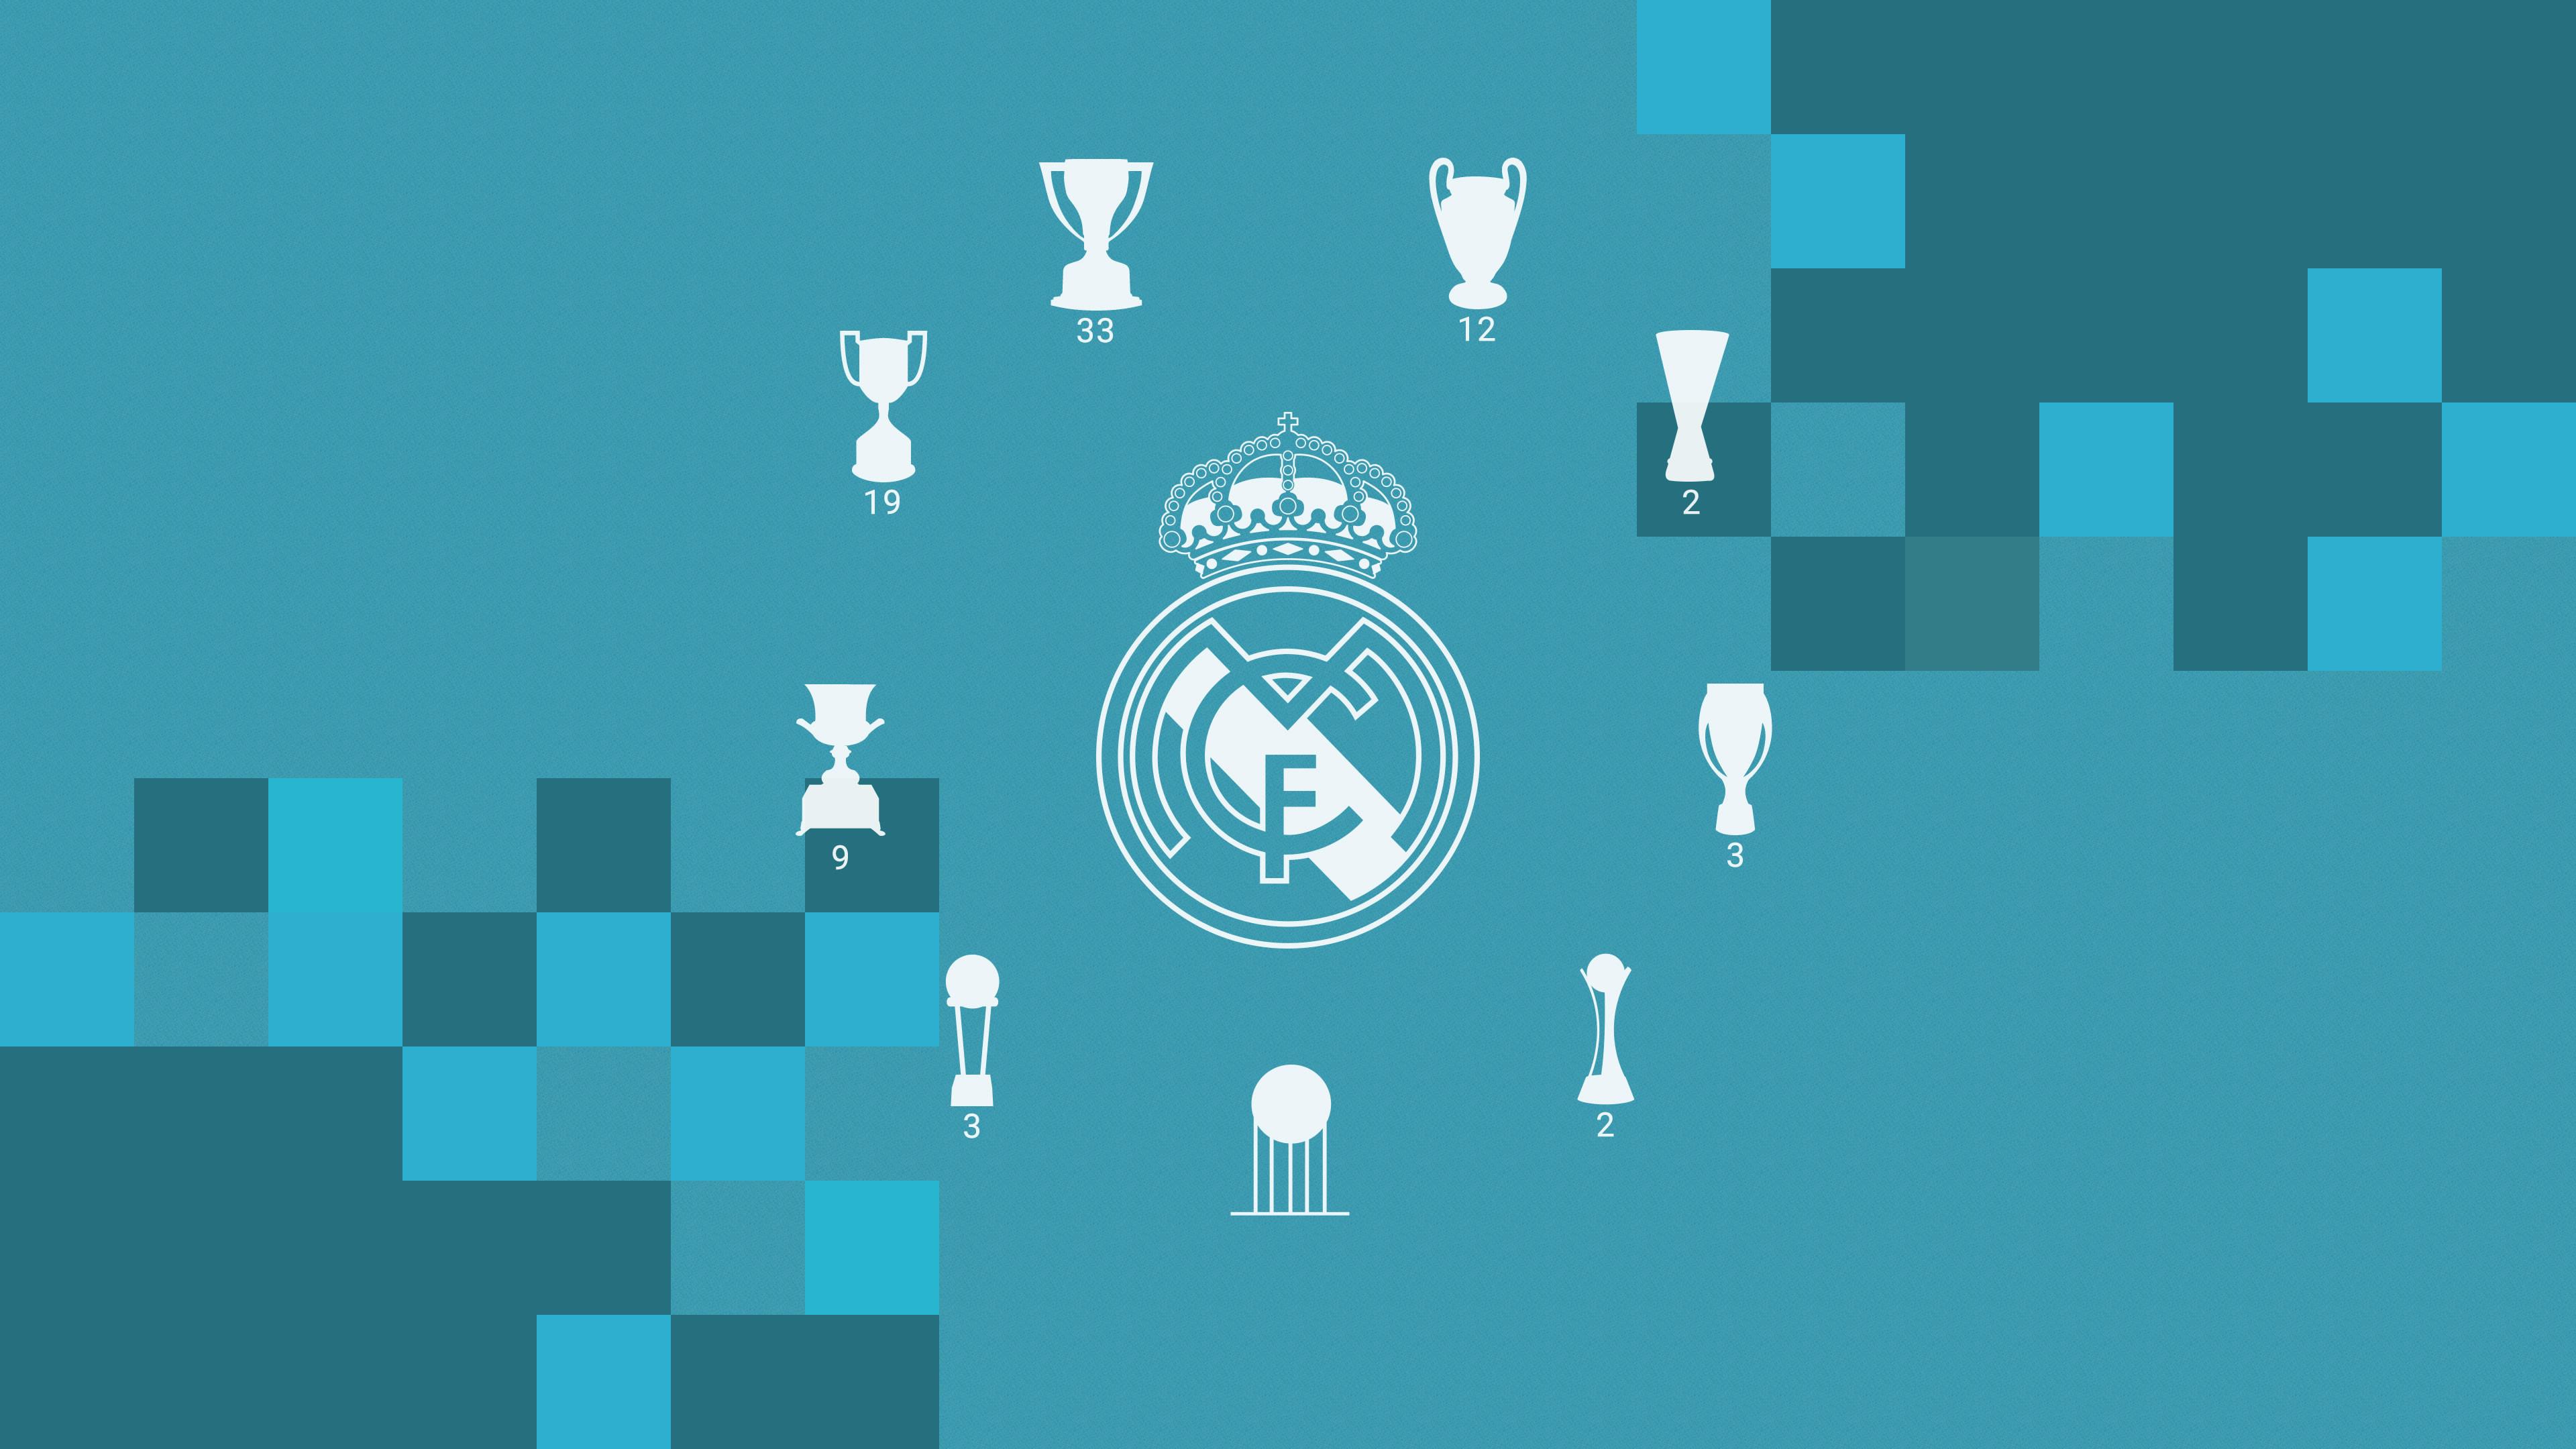 3840x2160 Khalidvawda 1 0 Real Madrid Third Wallpaper 2017 18 By